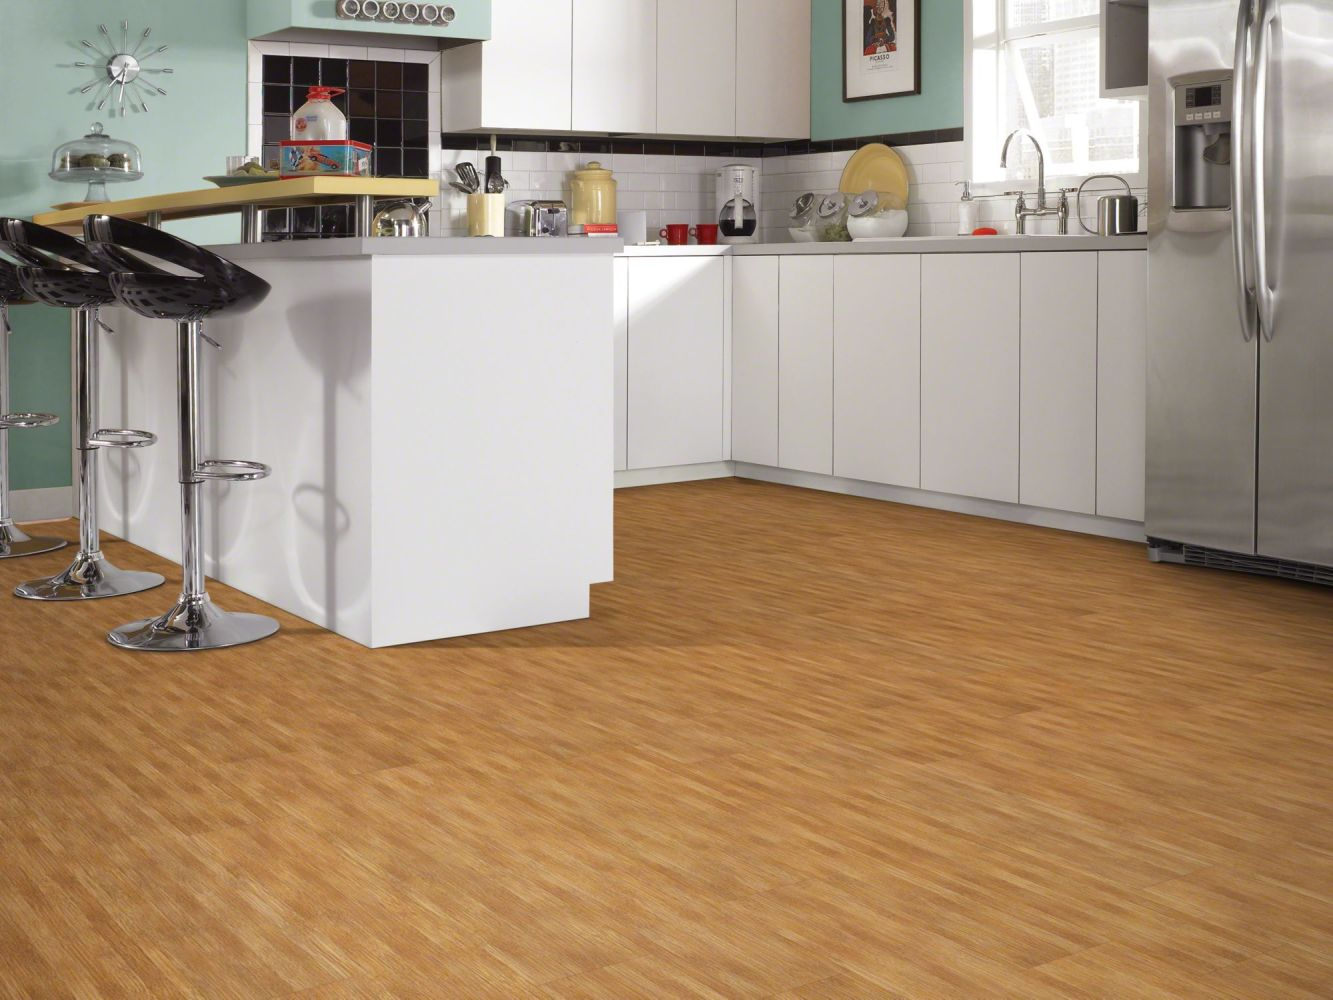 Shaw Floors Resilient Residential Urbanality 6 Plank Bridgeway 00768_0309V